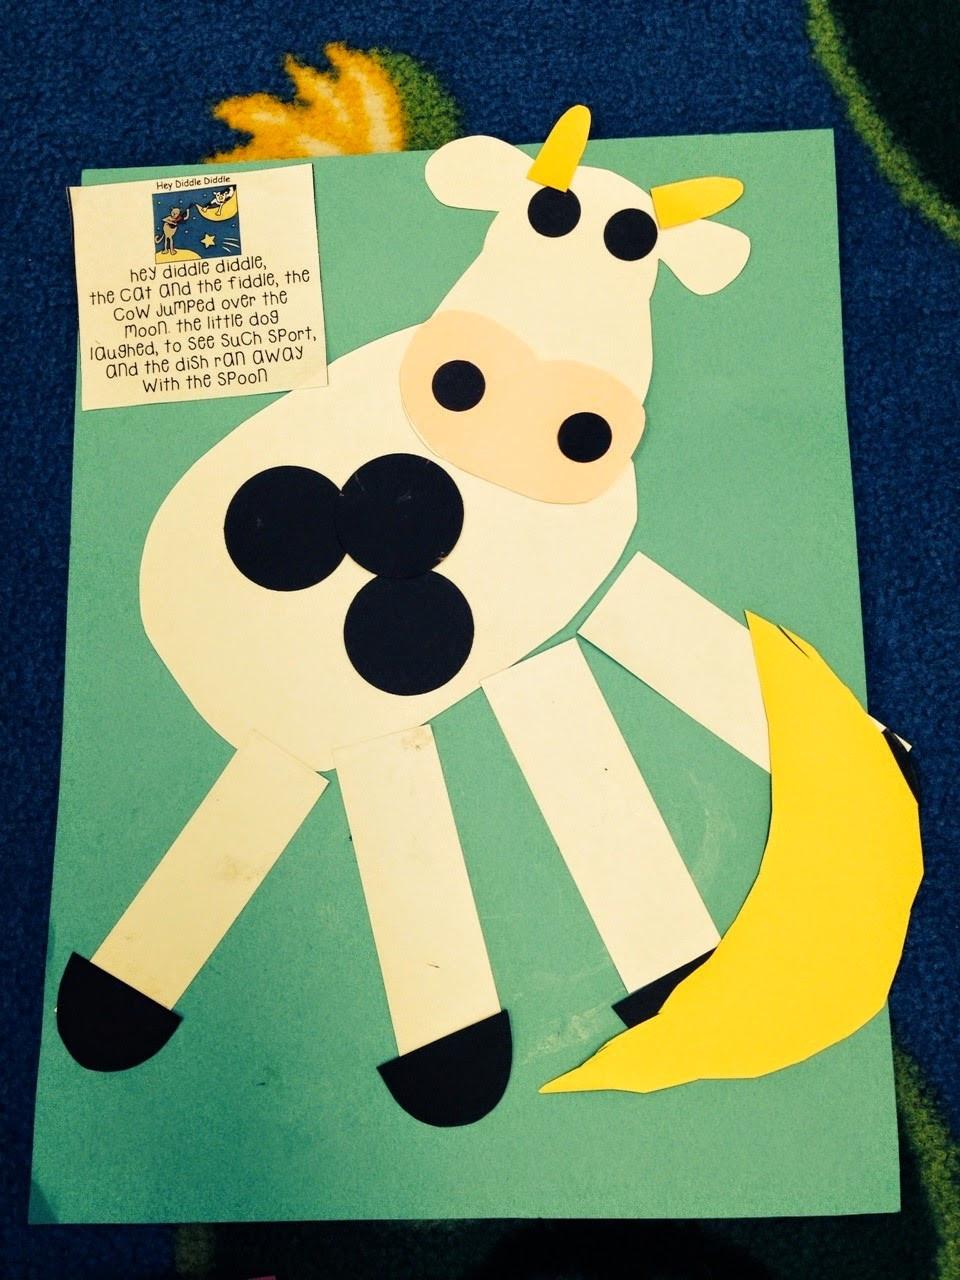 Best ideas about Crafts For Preschool Kids . Save or Pin Preschool Wonders Nursery Rhymes Second Verse Now.